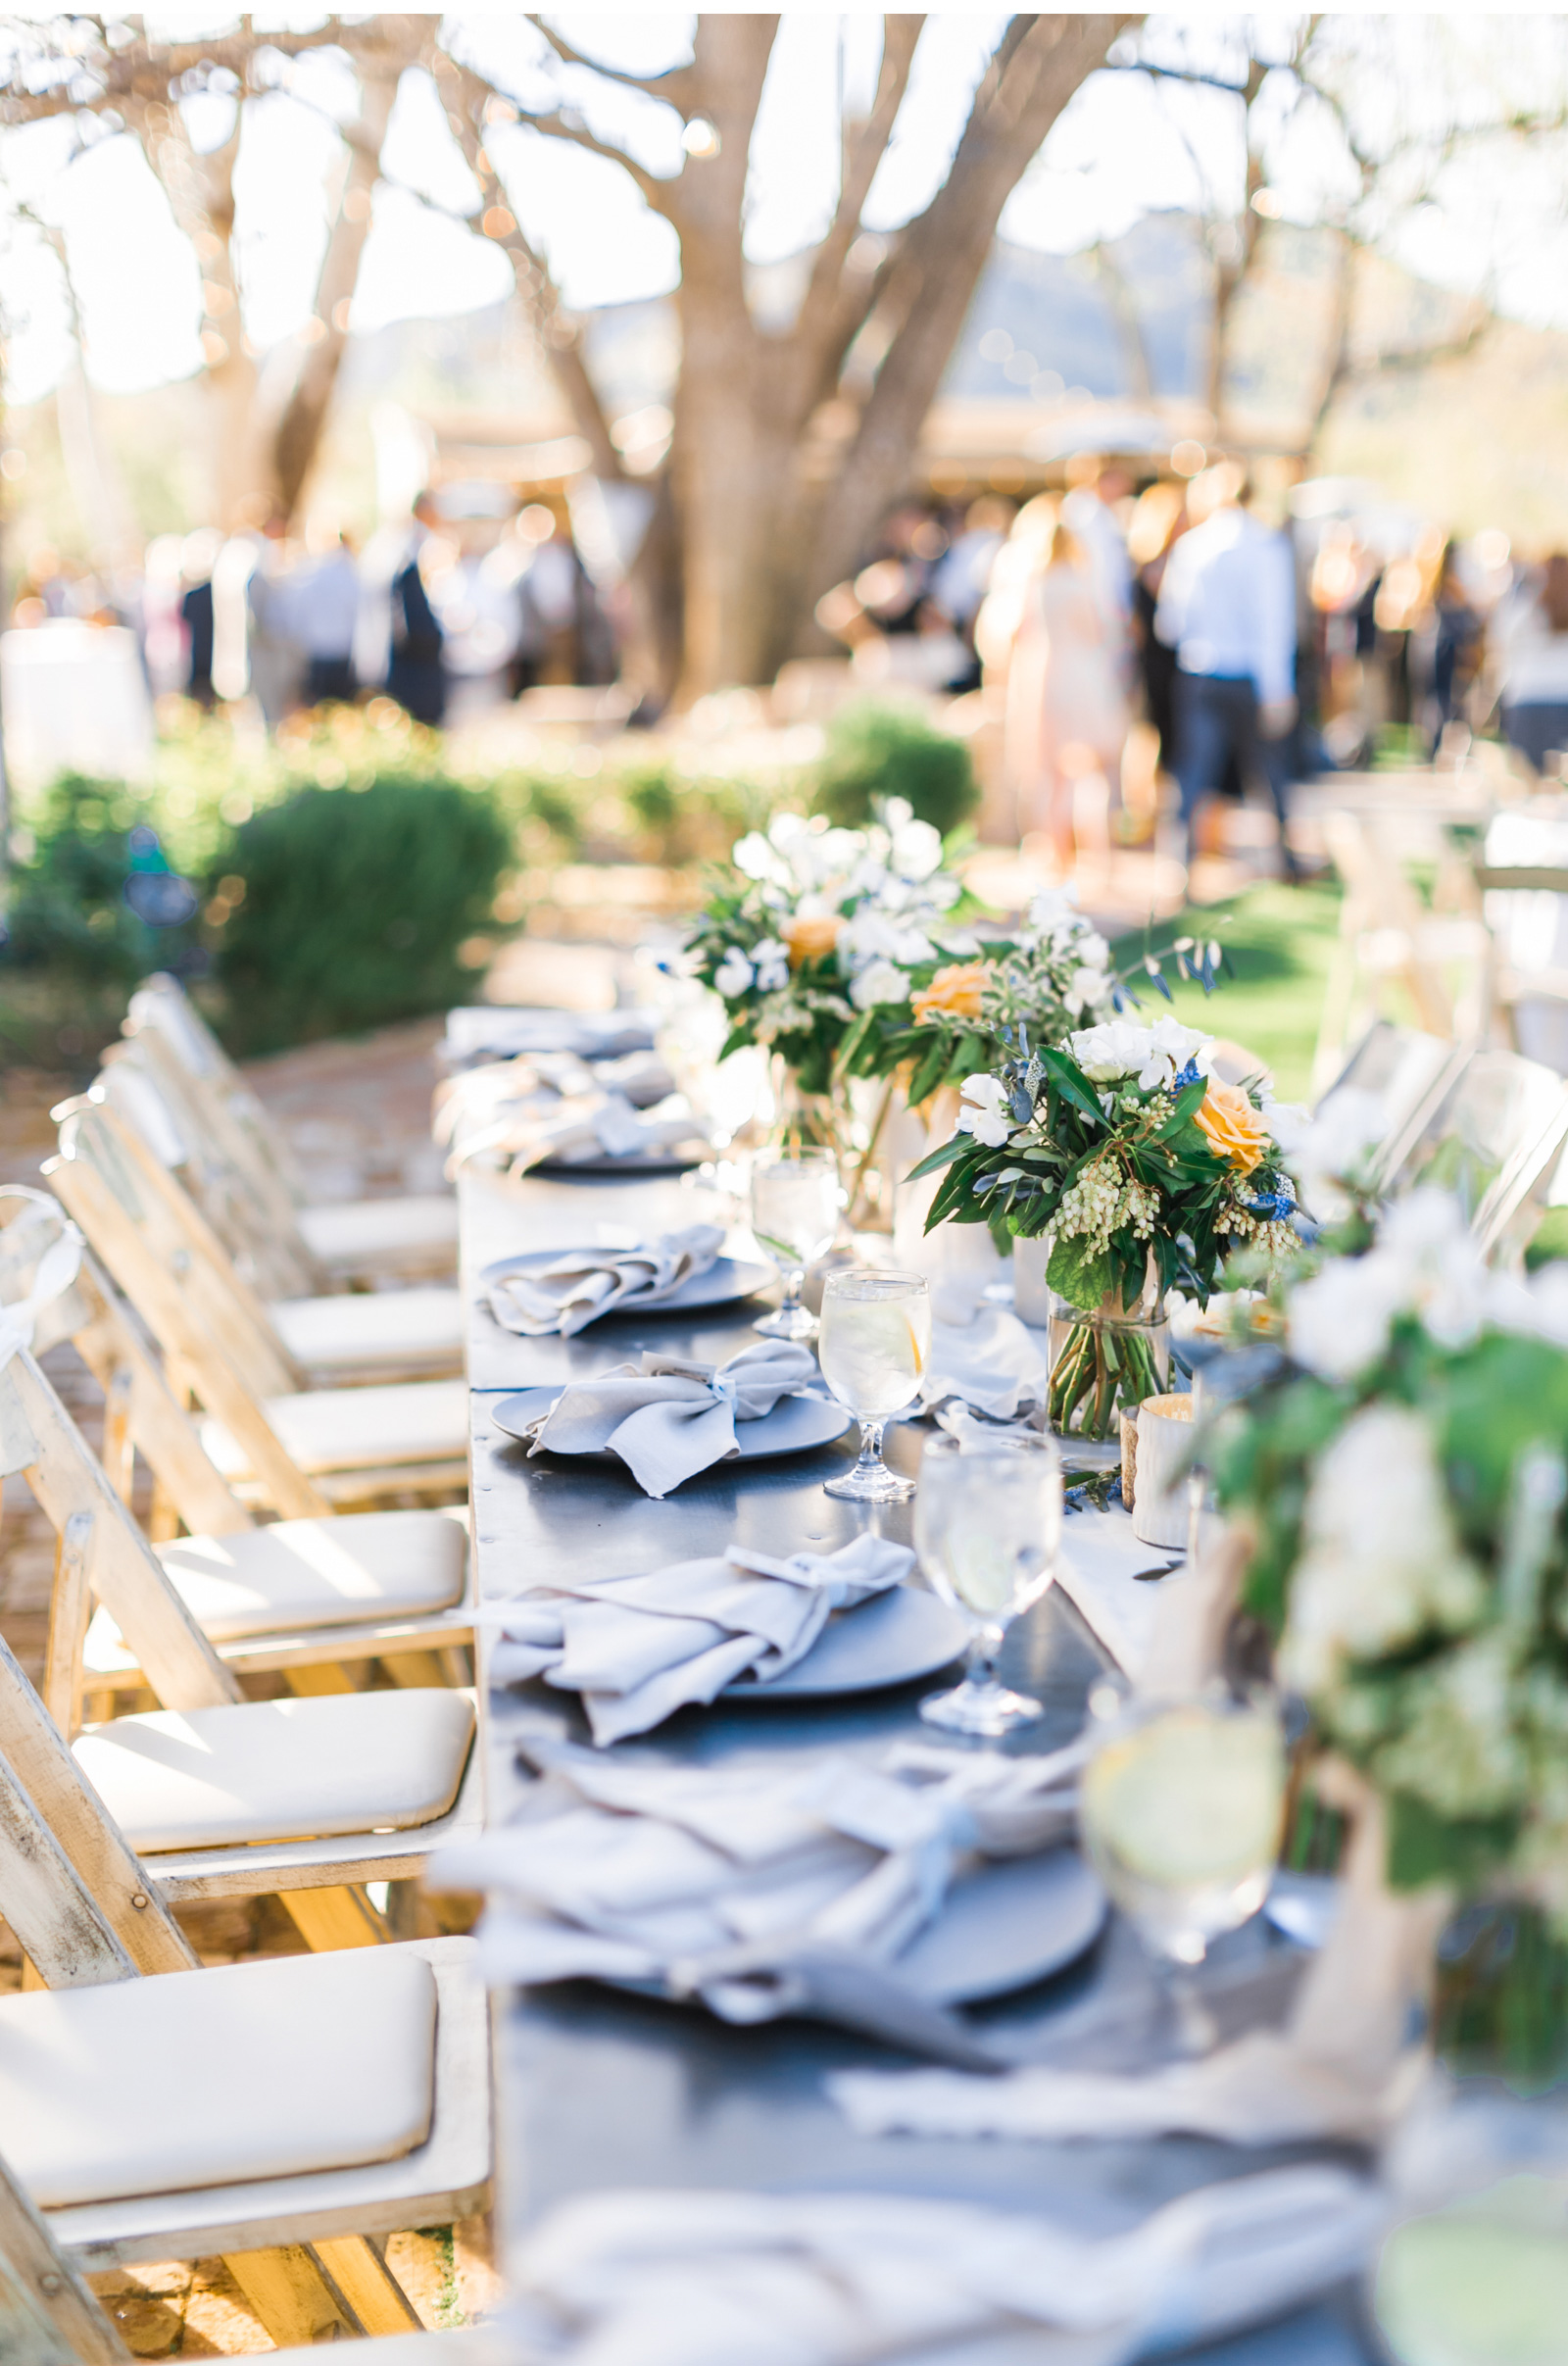 Triunfo-Creek-Malibu-Wedding-Natalie-Schutt-Photography-Couture-Events-Style-Me-Pretty_15.jpg